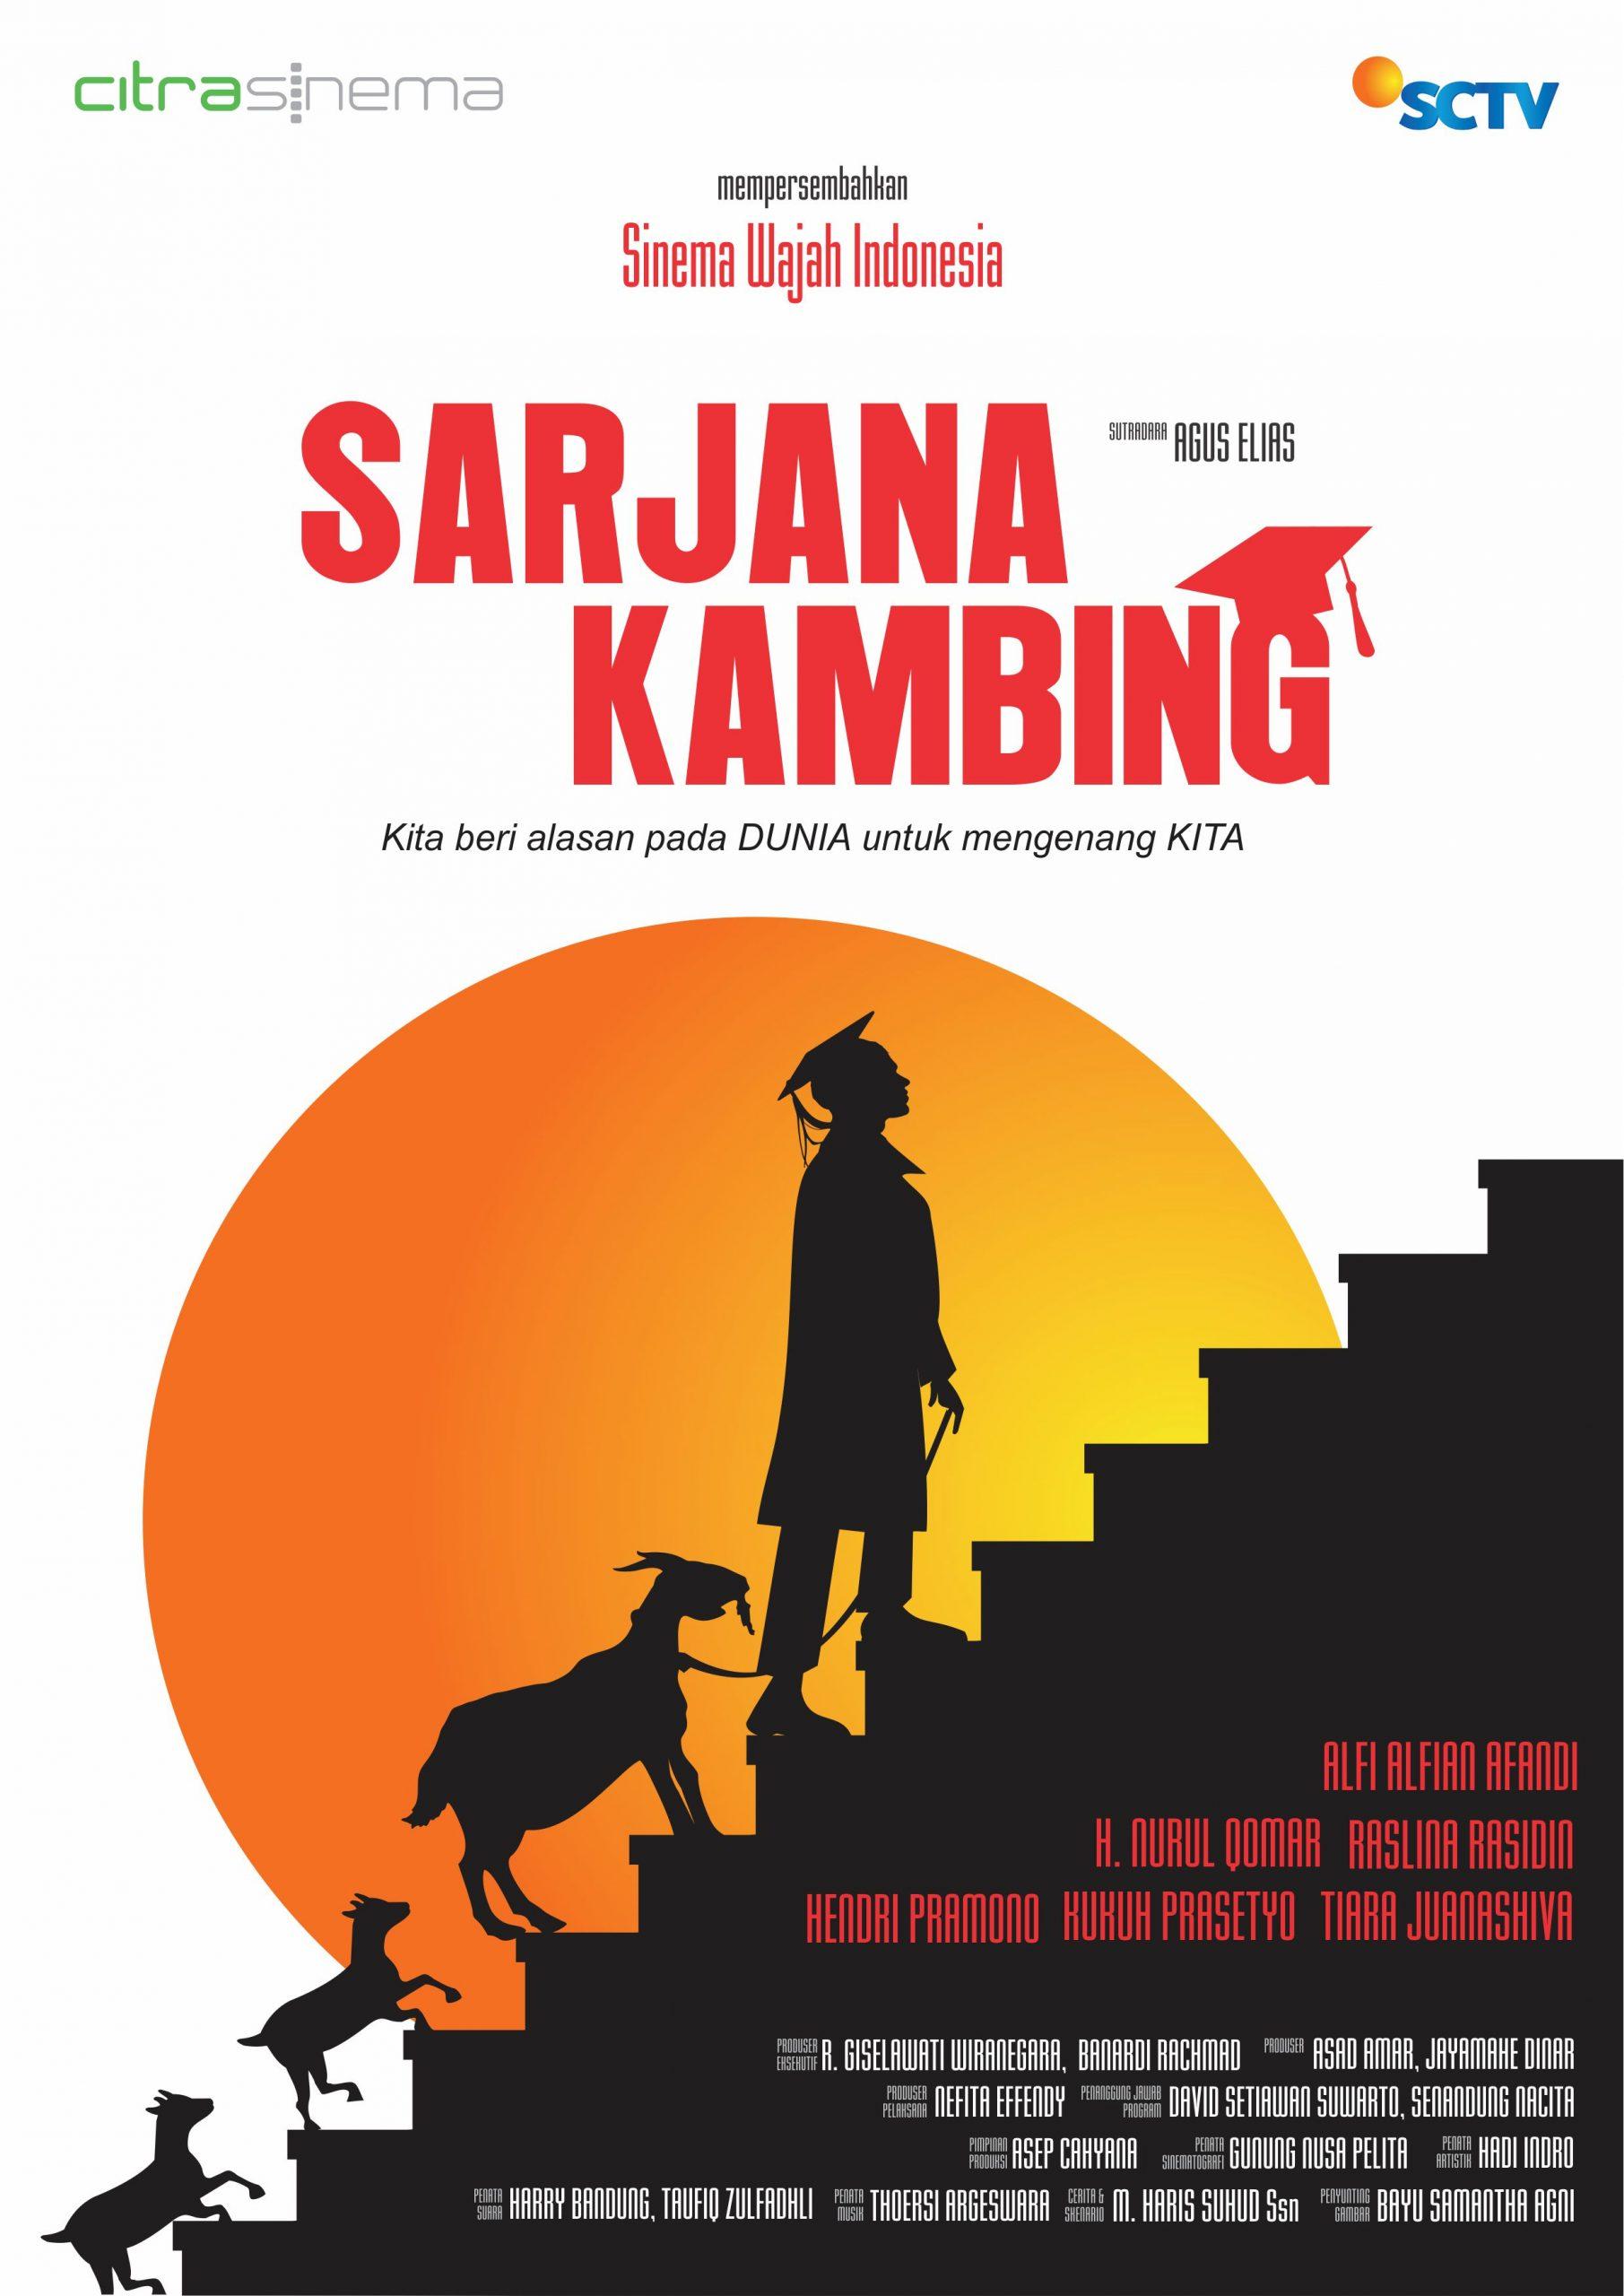 Sarjana Kambing